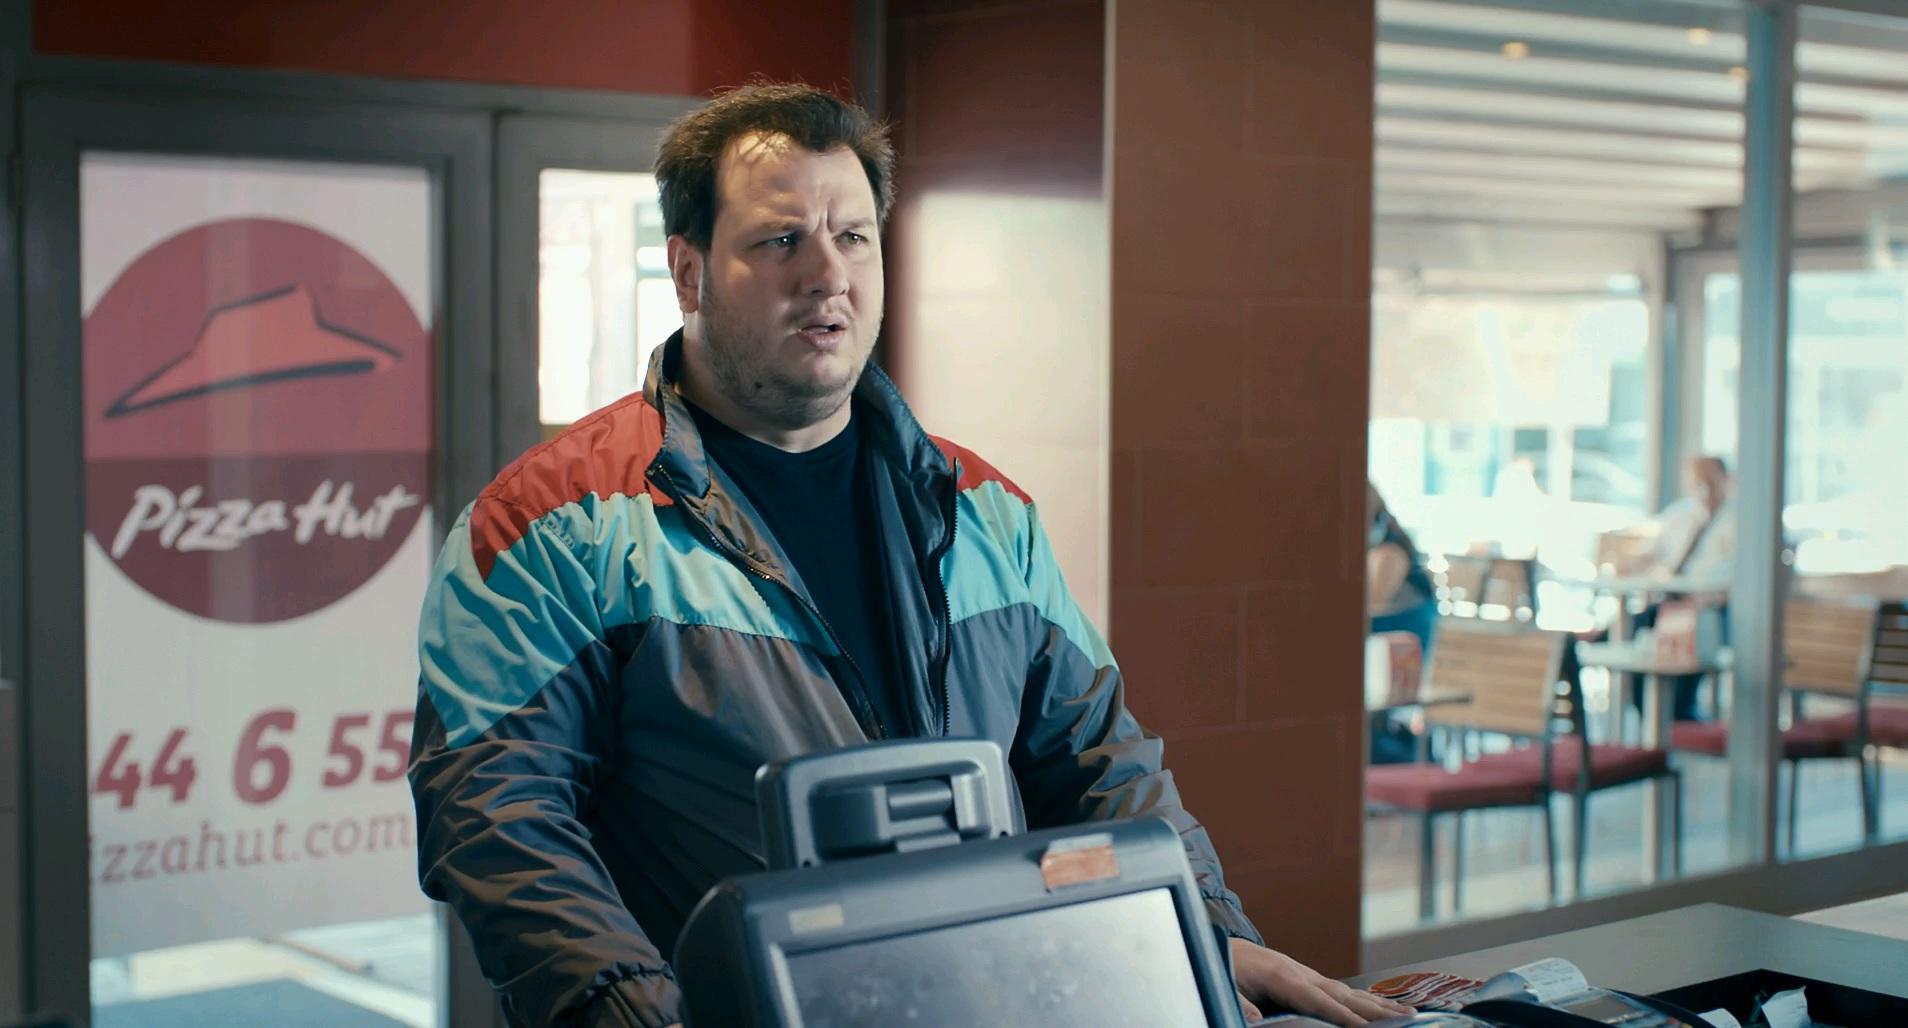 Celal ile Ceren   2013   Yerli Film   WEB-DL   XviD   Sansürsüz   m720p - m1080p   WEB-DL   Tek Link